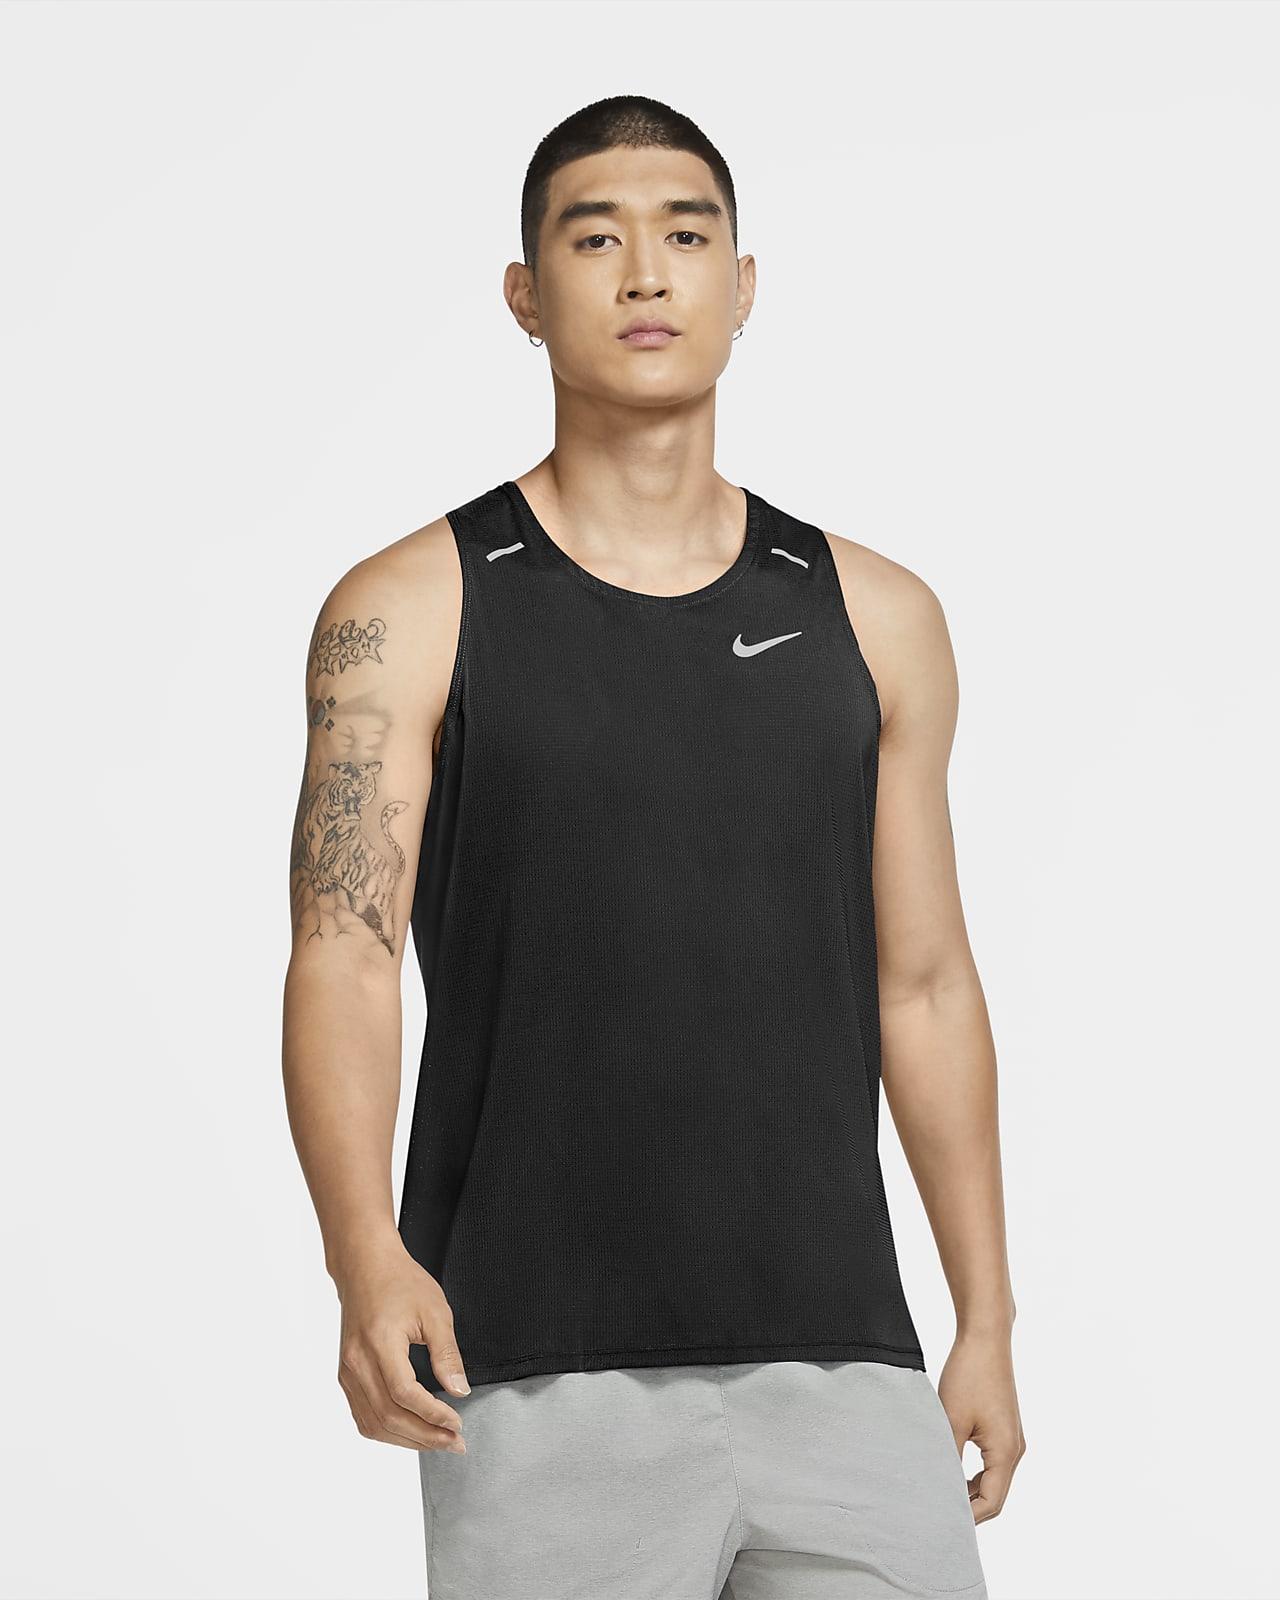 Nike Breathe Rise 365 Camiseta de tirantes de running híbrida - Hombre